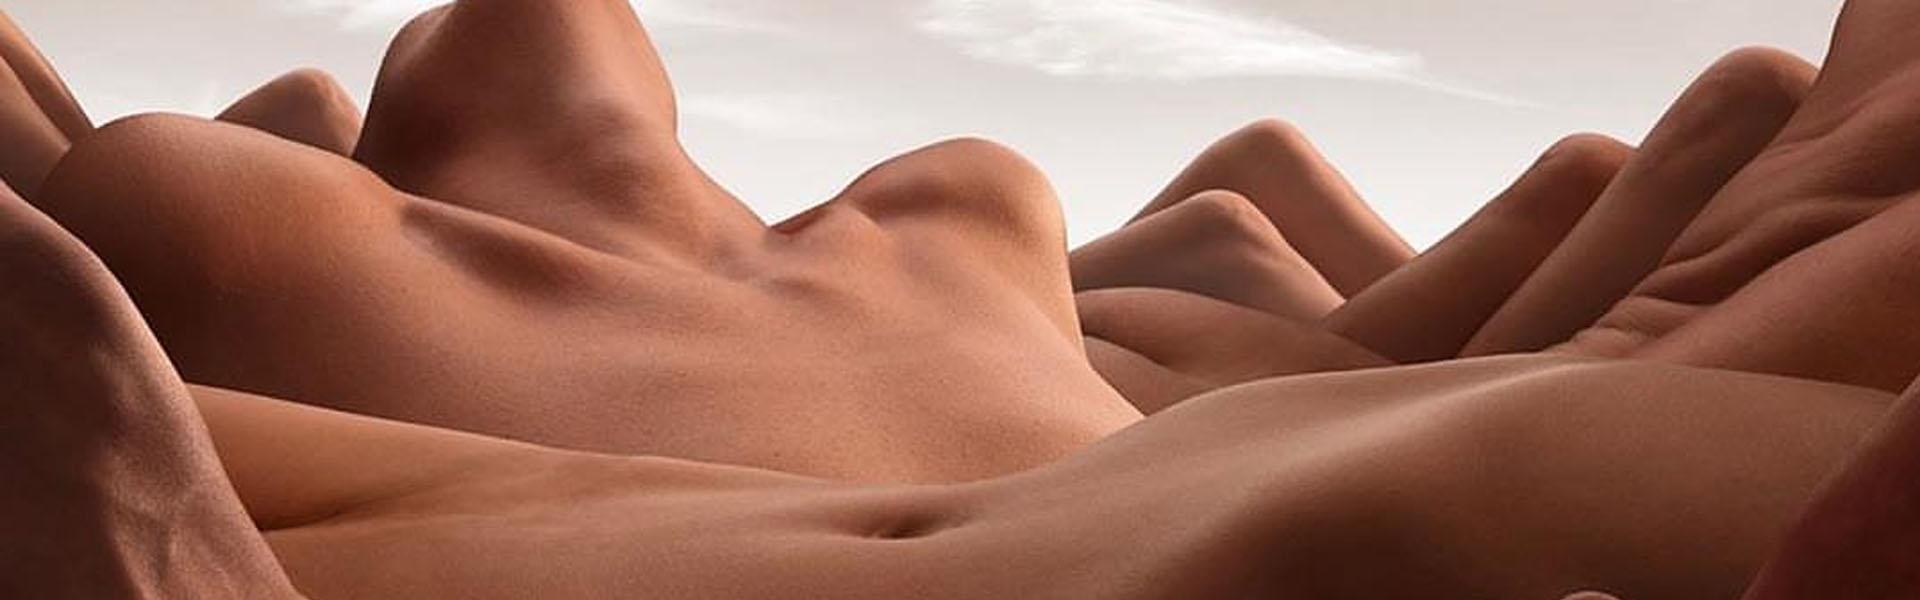 madhuspa, blog, massagem indiana,